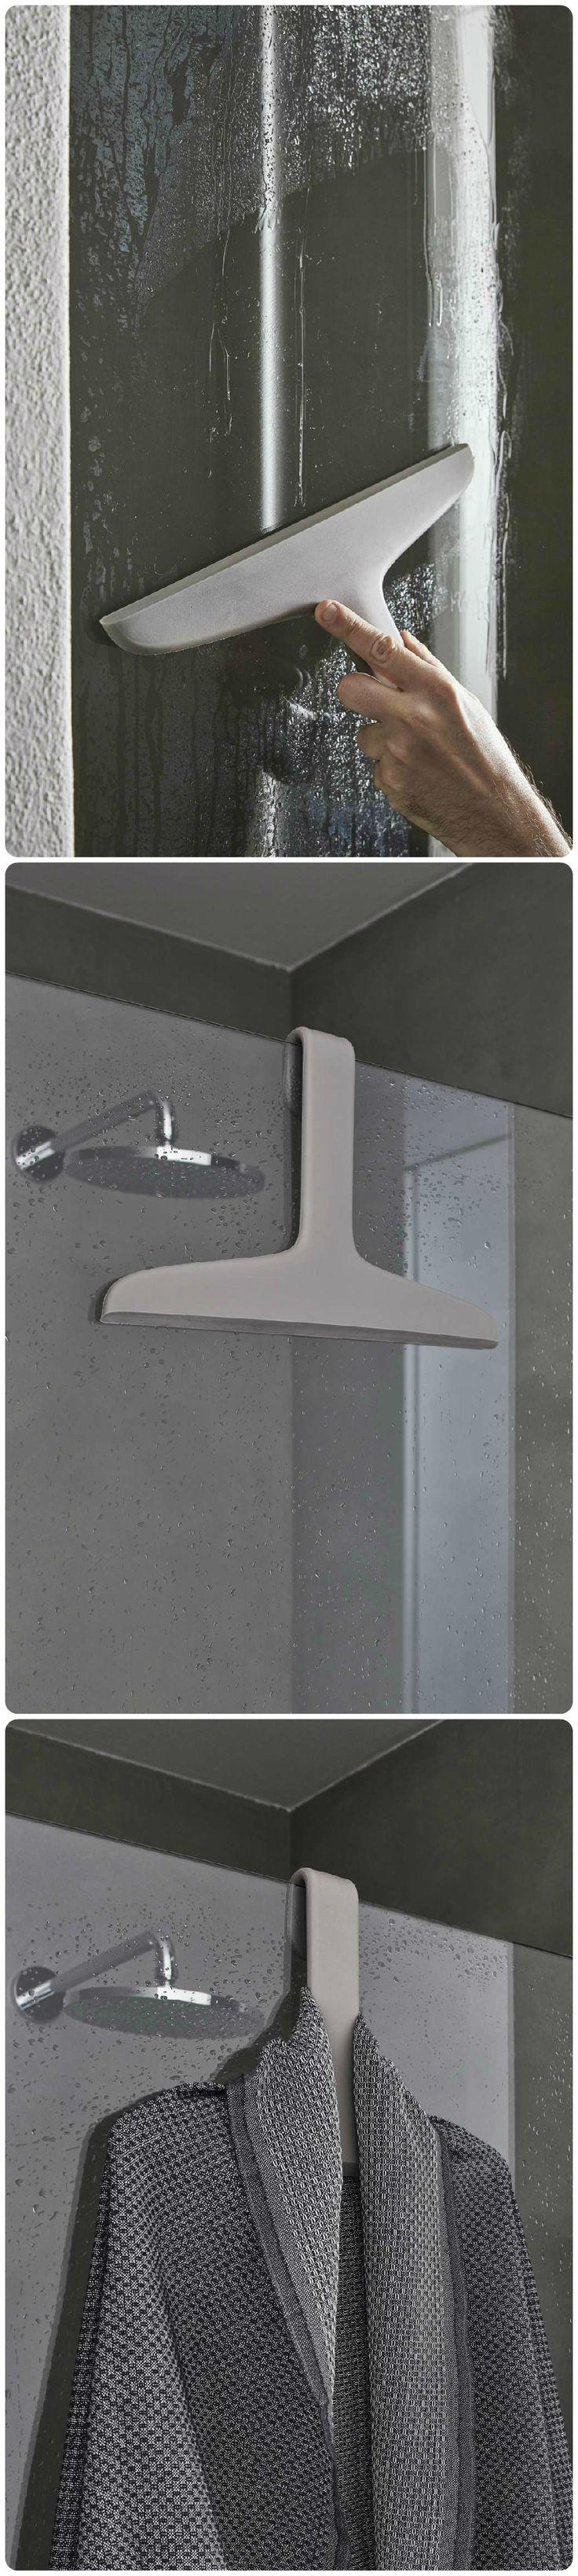 TITO - Useful to clean the shower glass but also as bathrobe hanger.  #geelli #geellinews2015 #tiraacqua #gruccia #appendino #doccia #shower #hanger